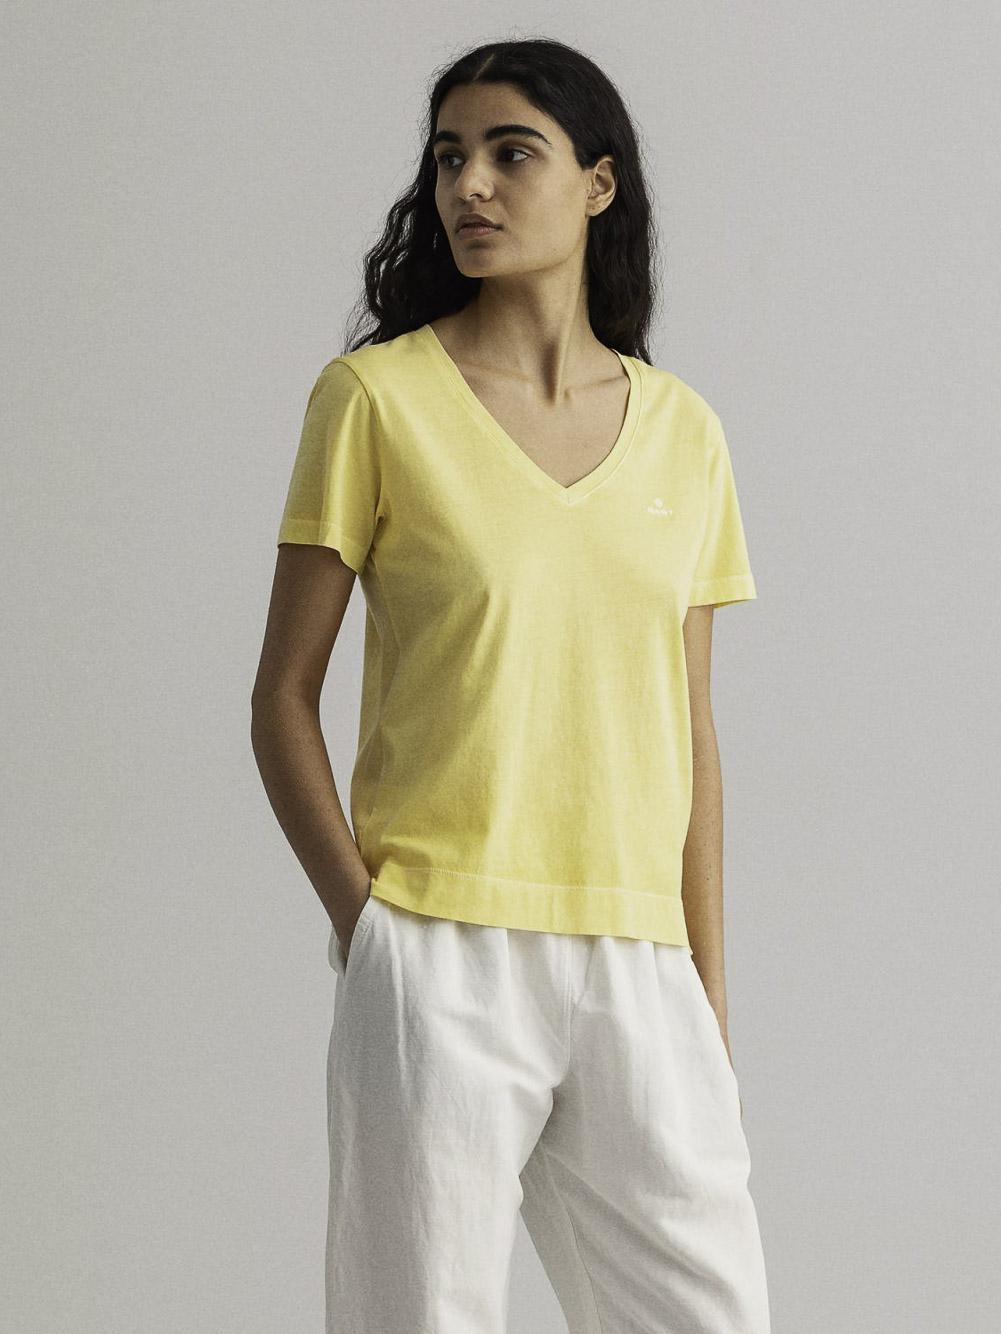 GANT Μπλούζα t-shirt 3GW4203468-749 ΚΙΤΡΙΝΟ